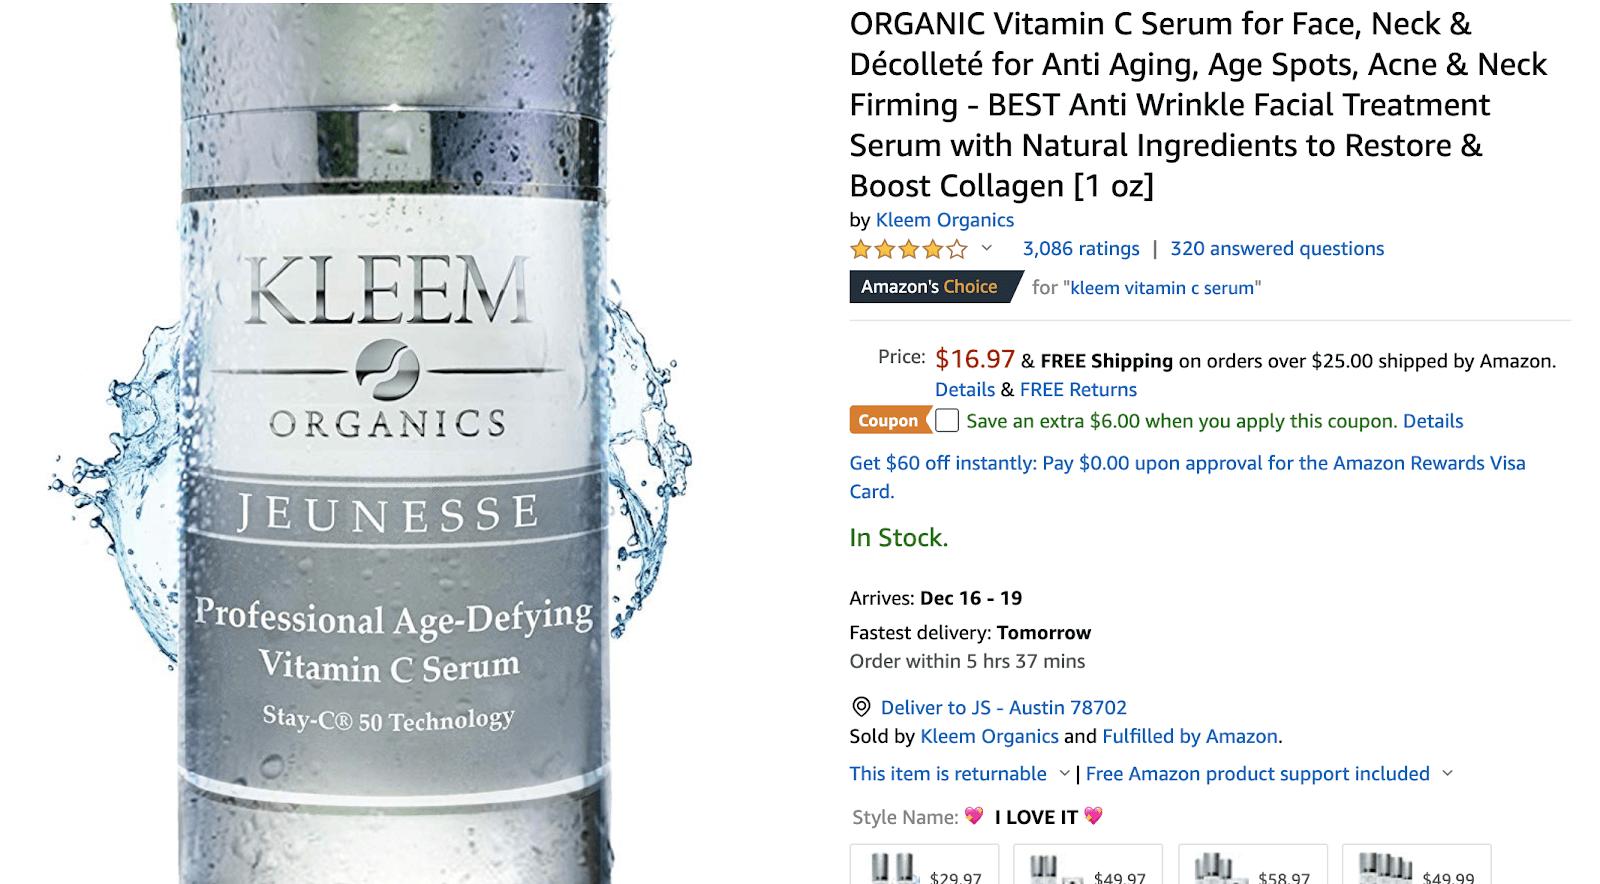 Amazon keyword research tools: Kleem Organics listing